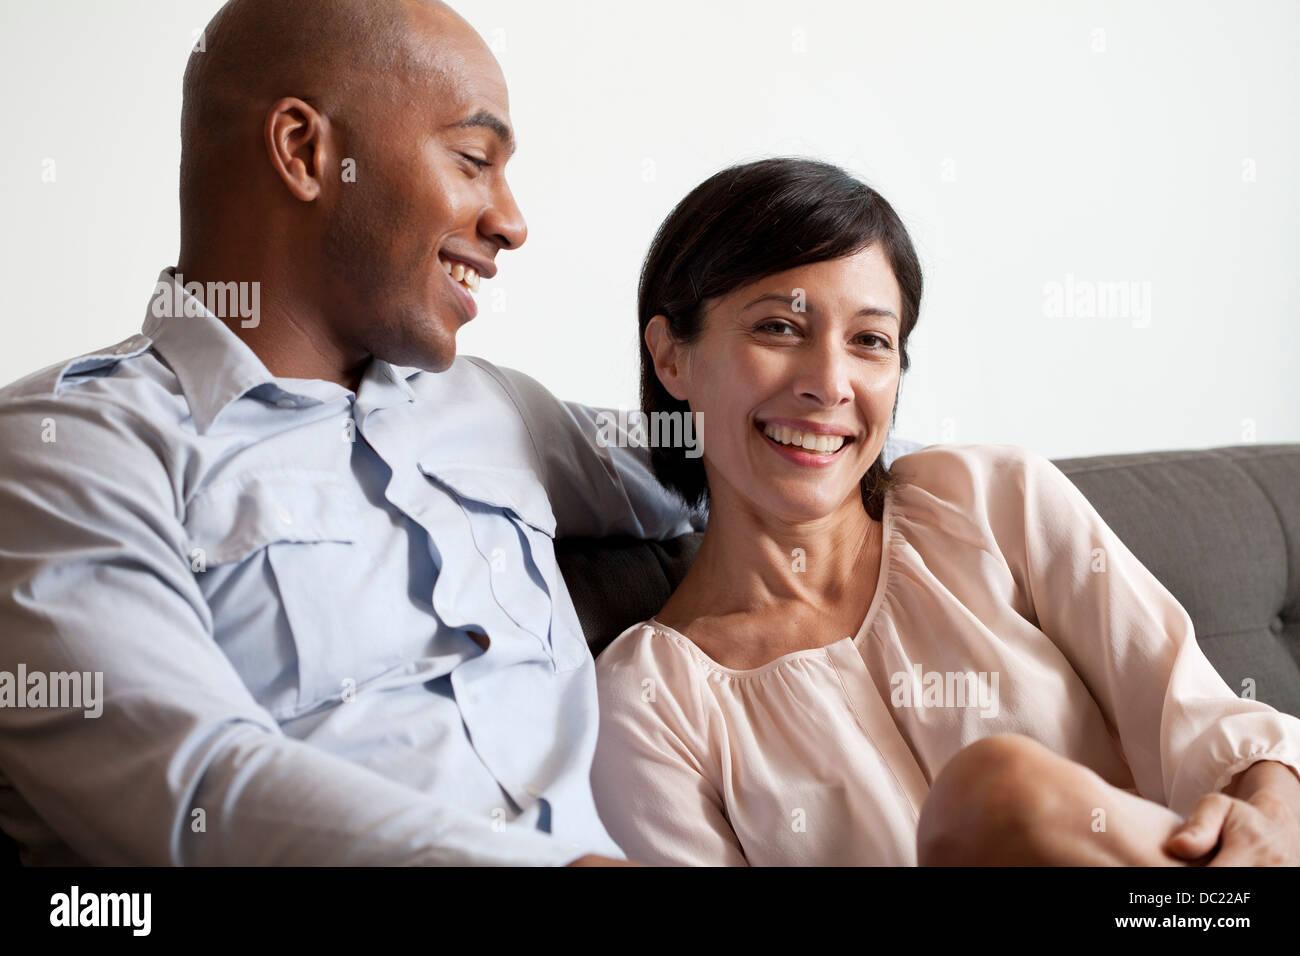 Couple relaxing on sofa, portrait - Stock Image